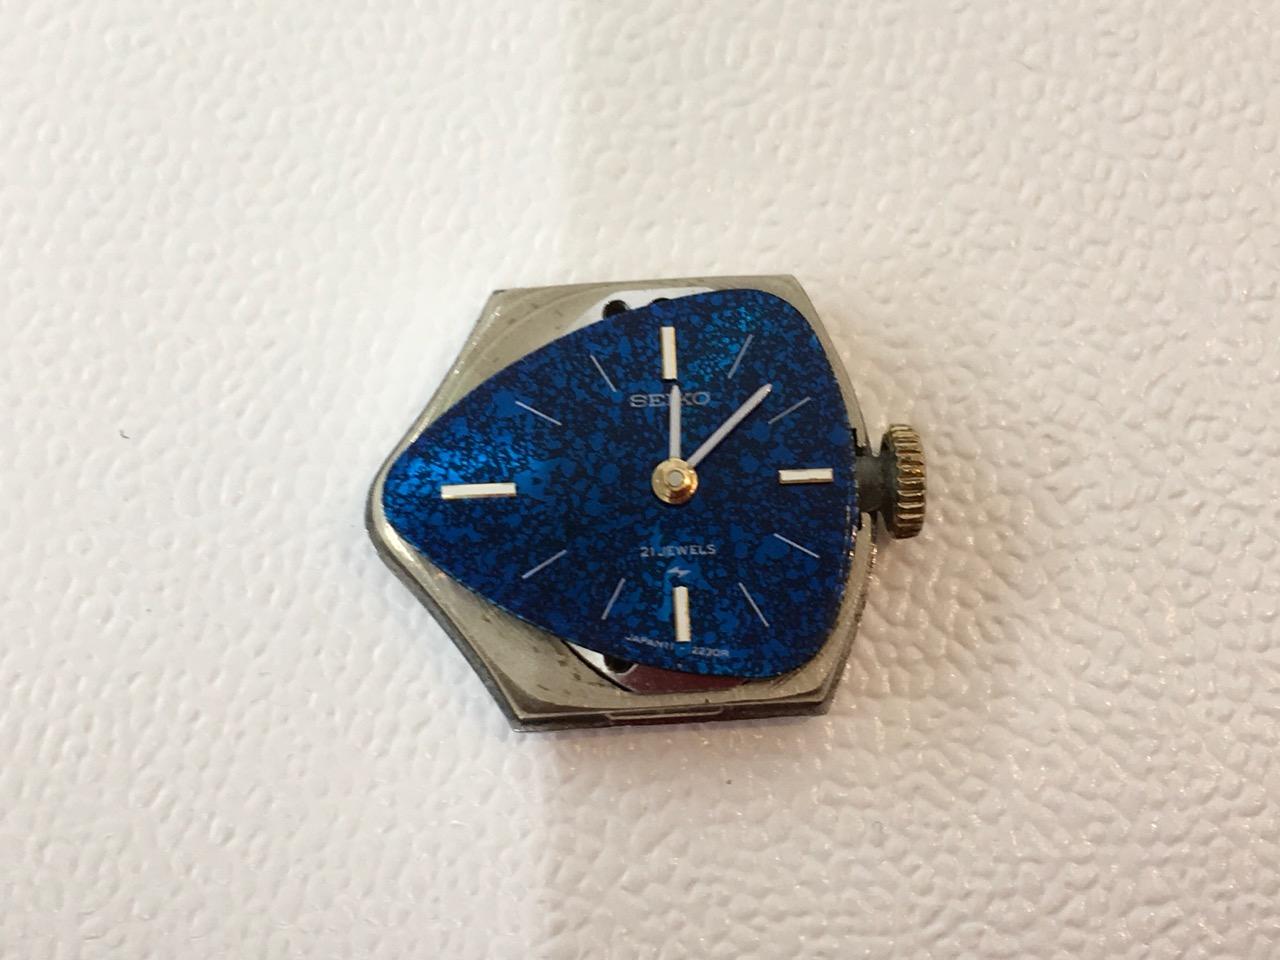 SEIKO セイコー 手巻き腕時計 分解掃除 オーバーホール 修理